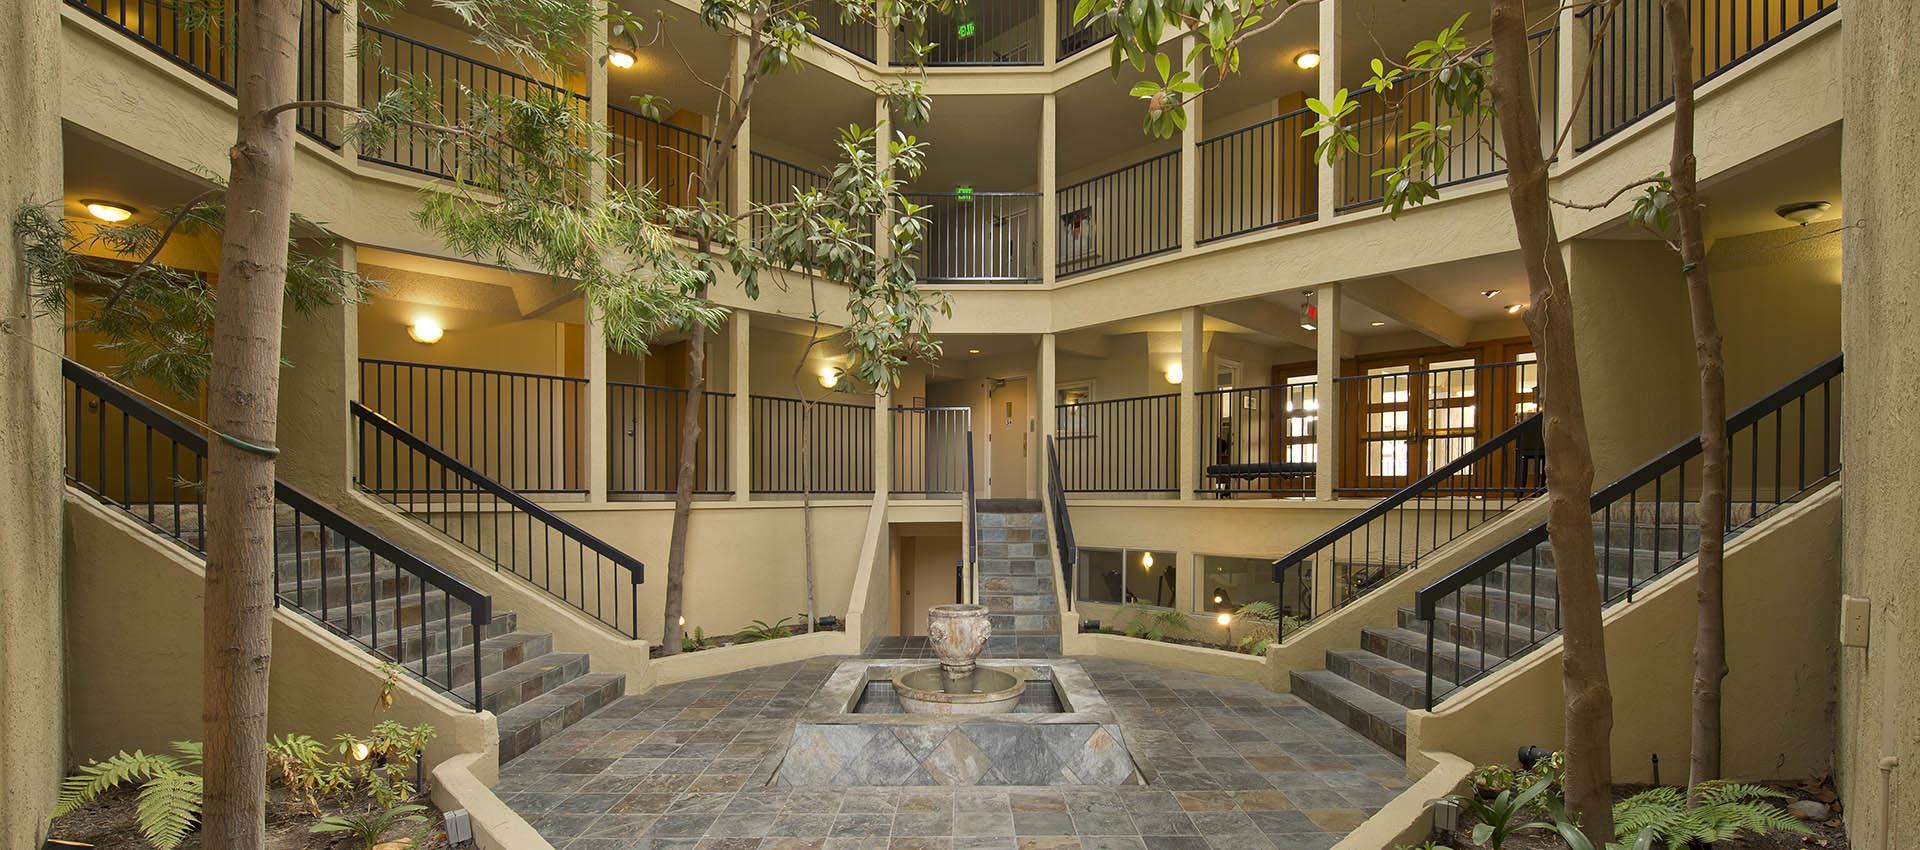 Atrium at Trinity House Apartment Homes in Walnut Creek